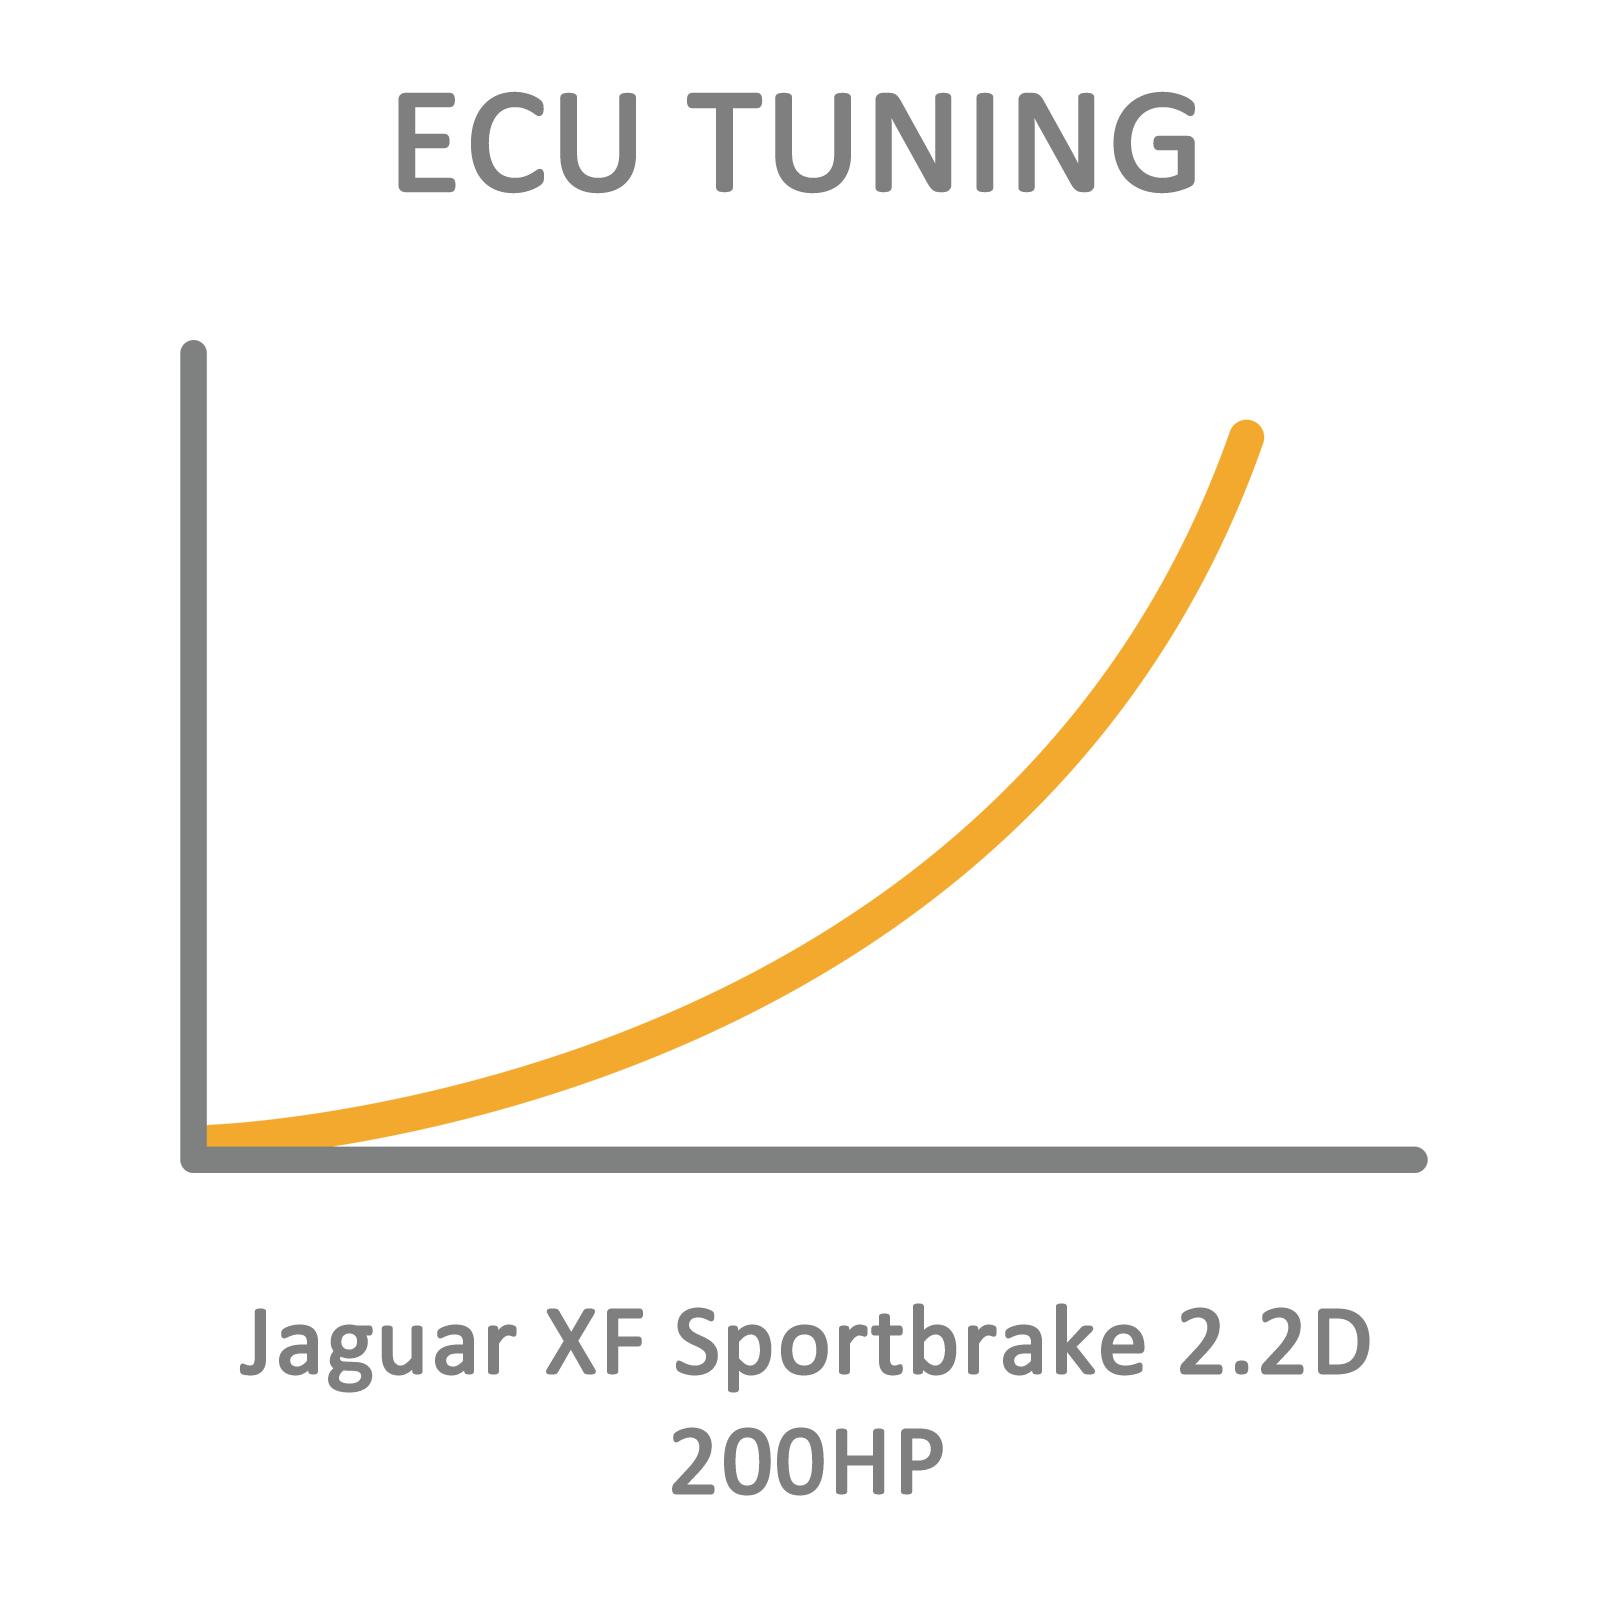 Jaguar XF Sportbrake 2.2D 200HP ECU Tuning Remapping